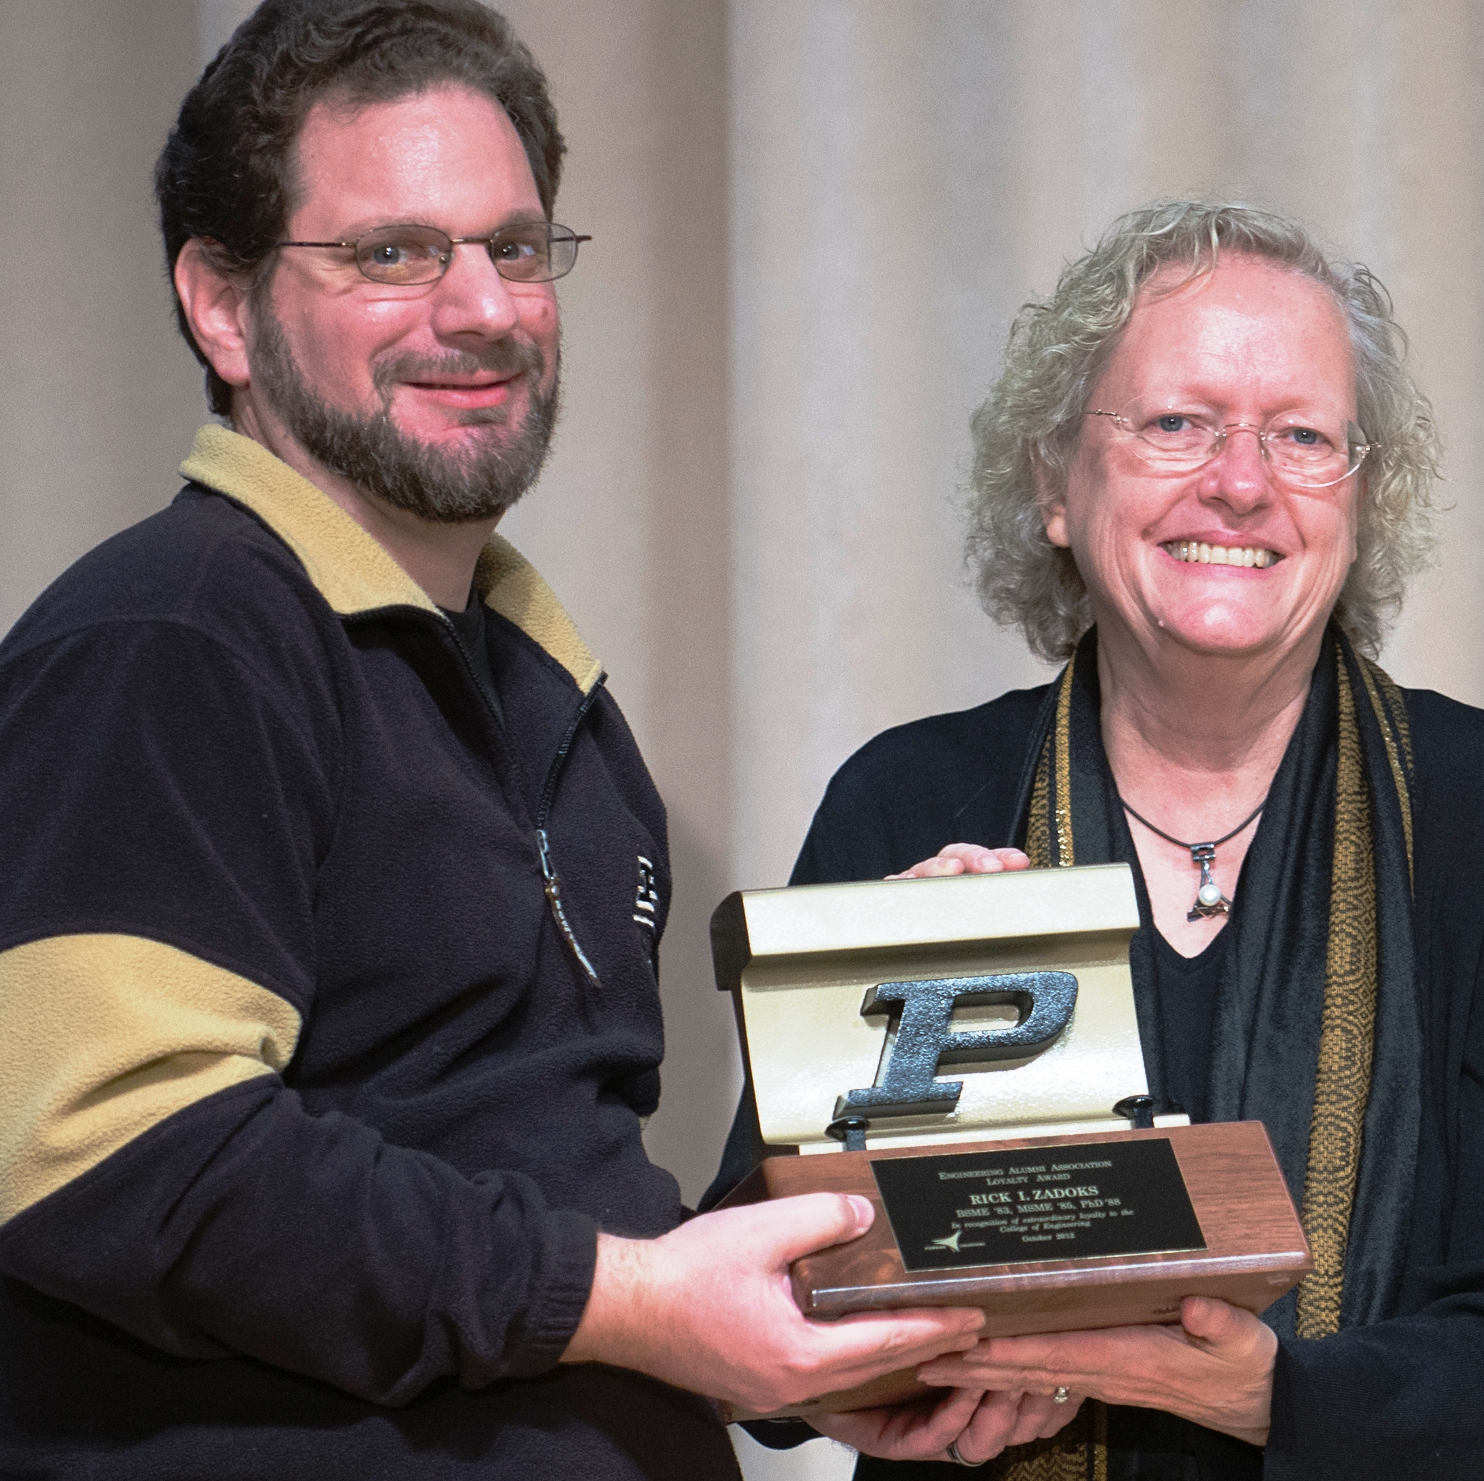 Rick Zadoks and Dean Leah Jamieson